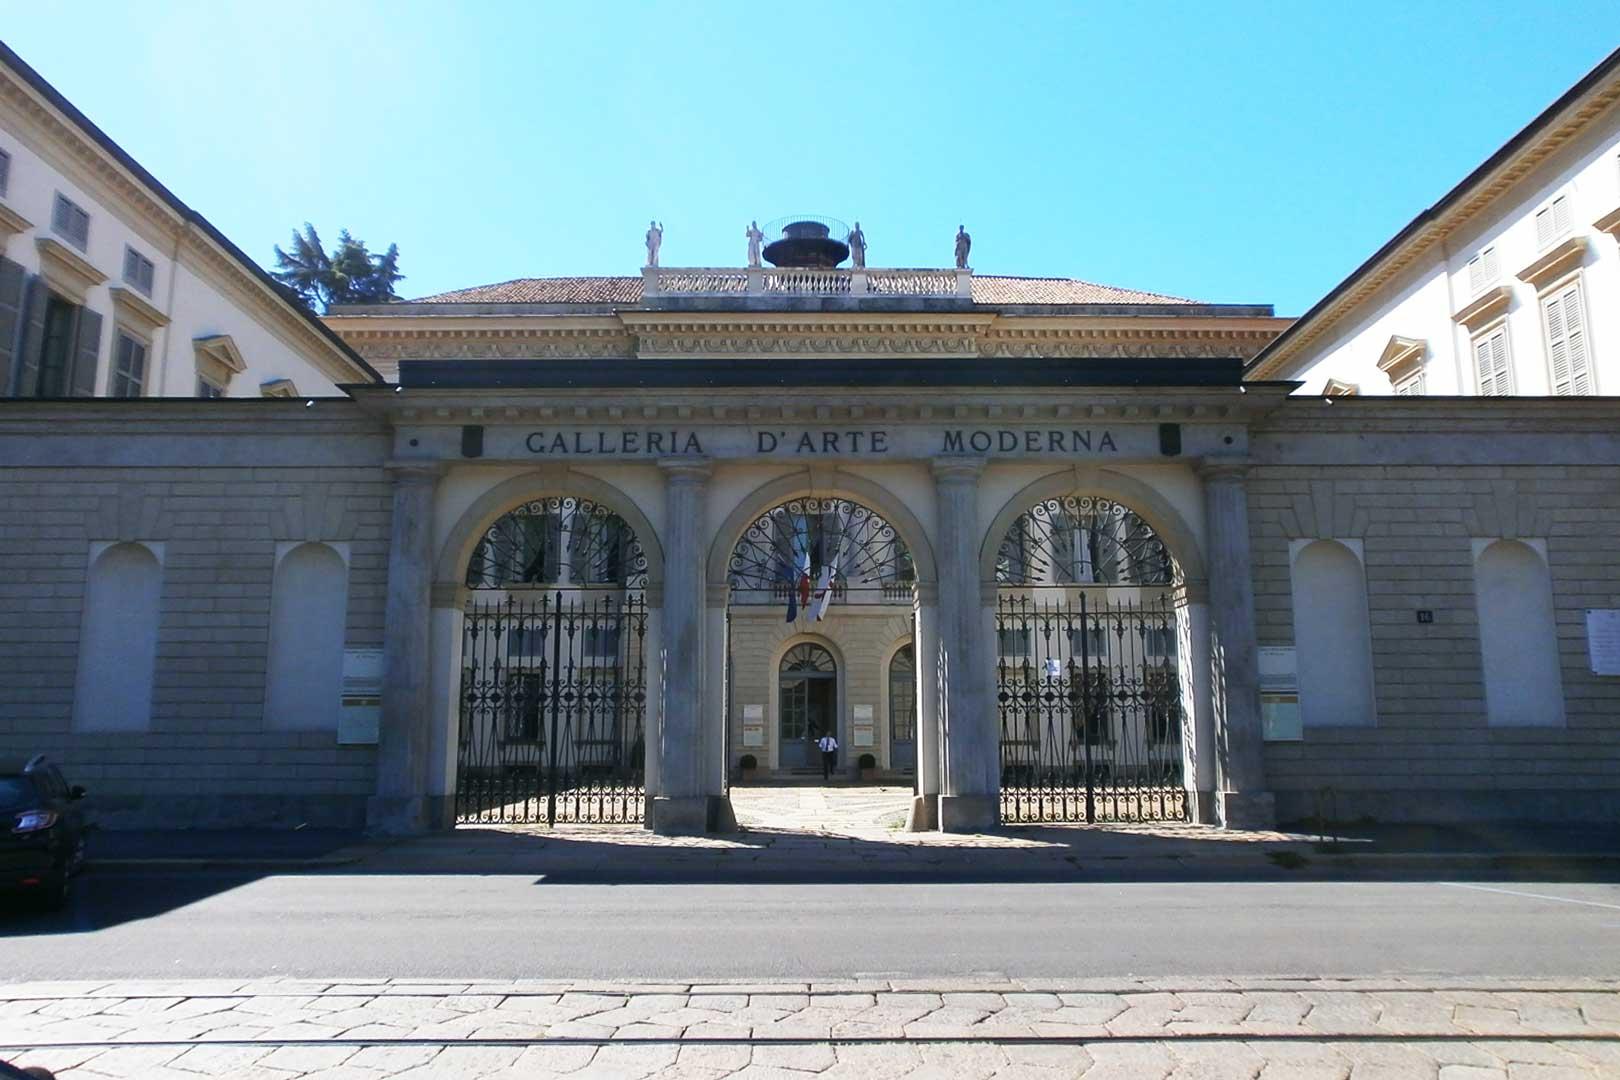 GAM - Galleria d'Arte Moderna